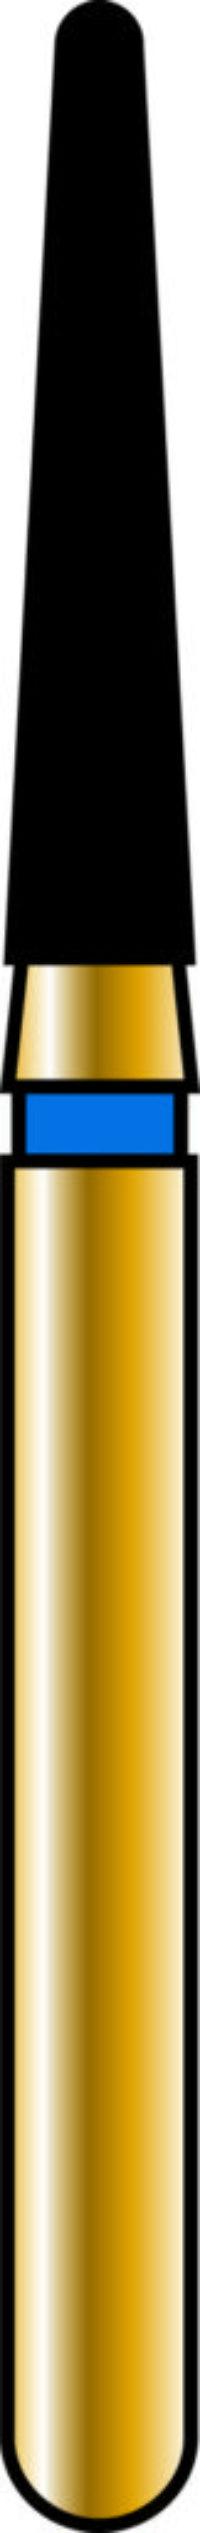 Round End Taper 16-8mm Gold Diamond Bur - Coarse Grit